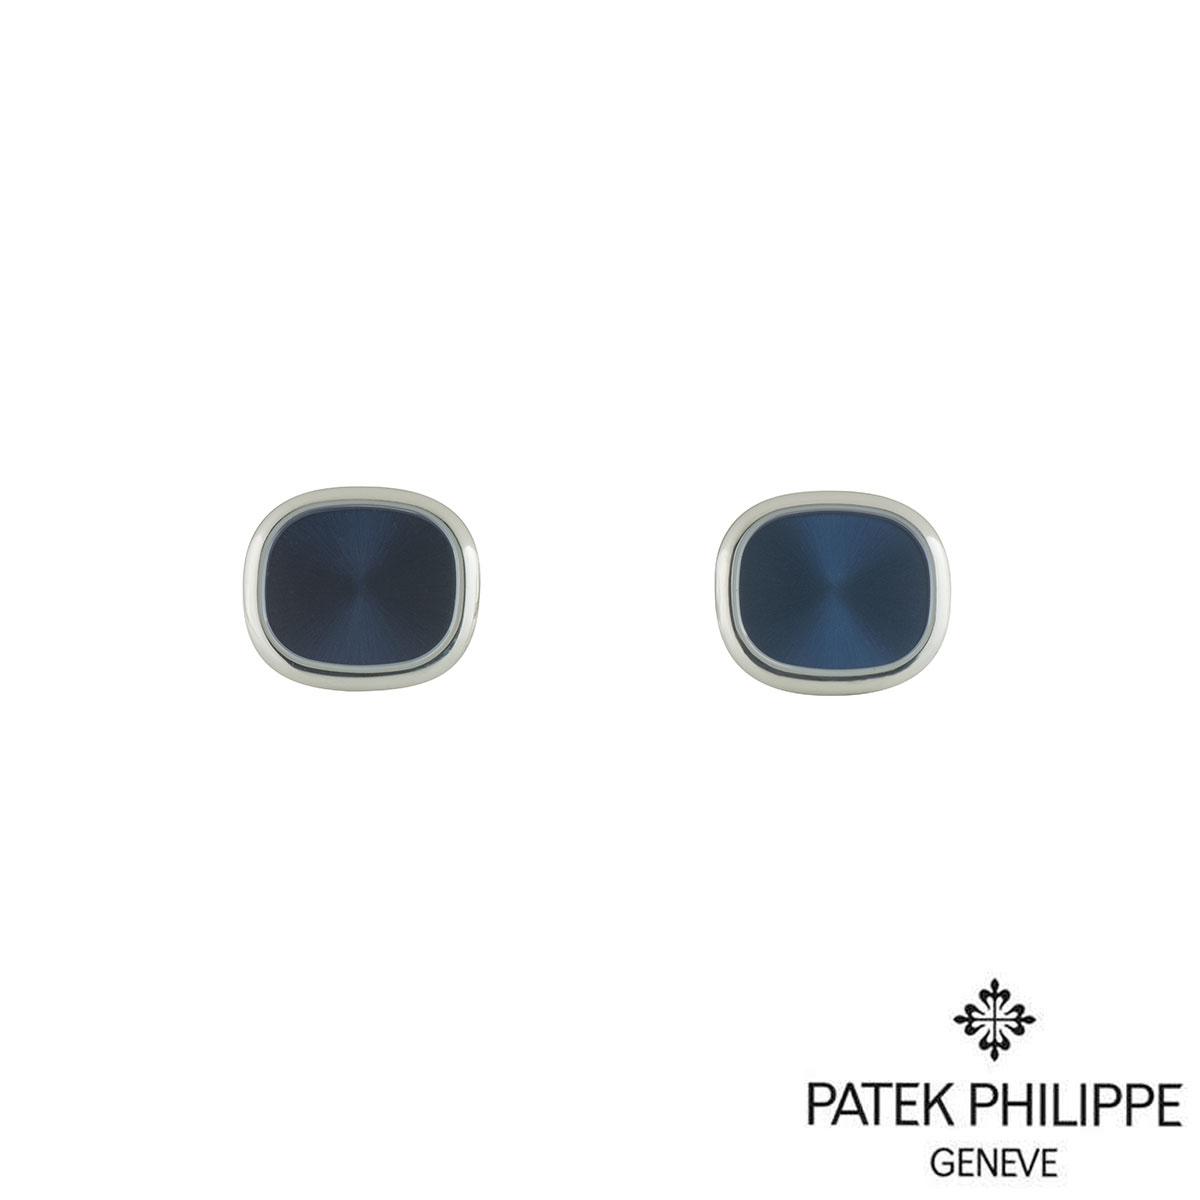 Patek Phillipe White Gold Ellipse Cufflinks 2059102G